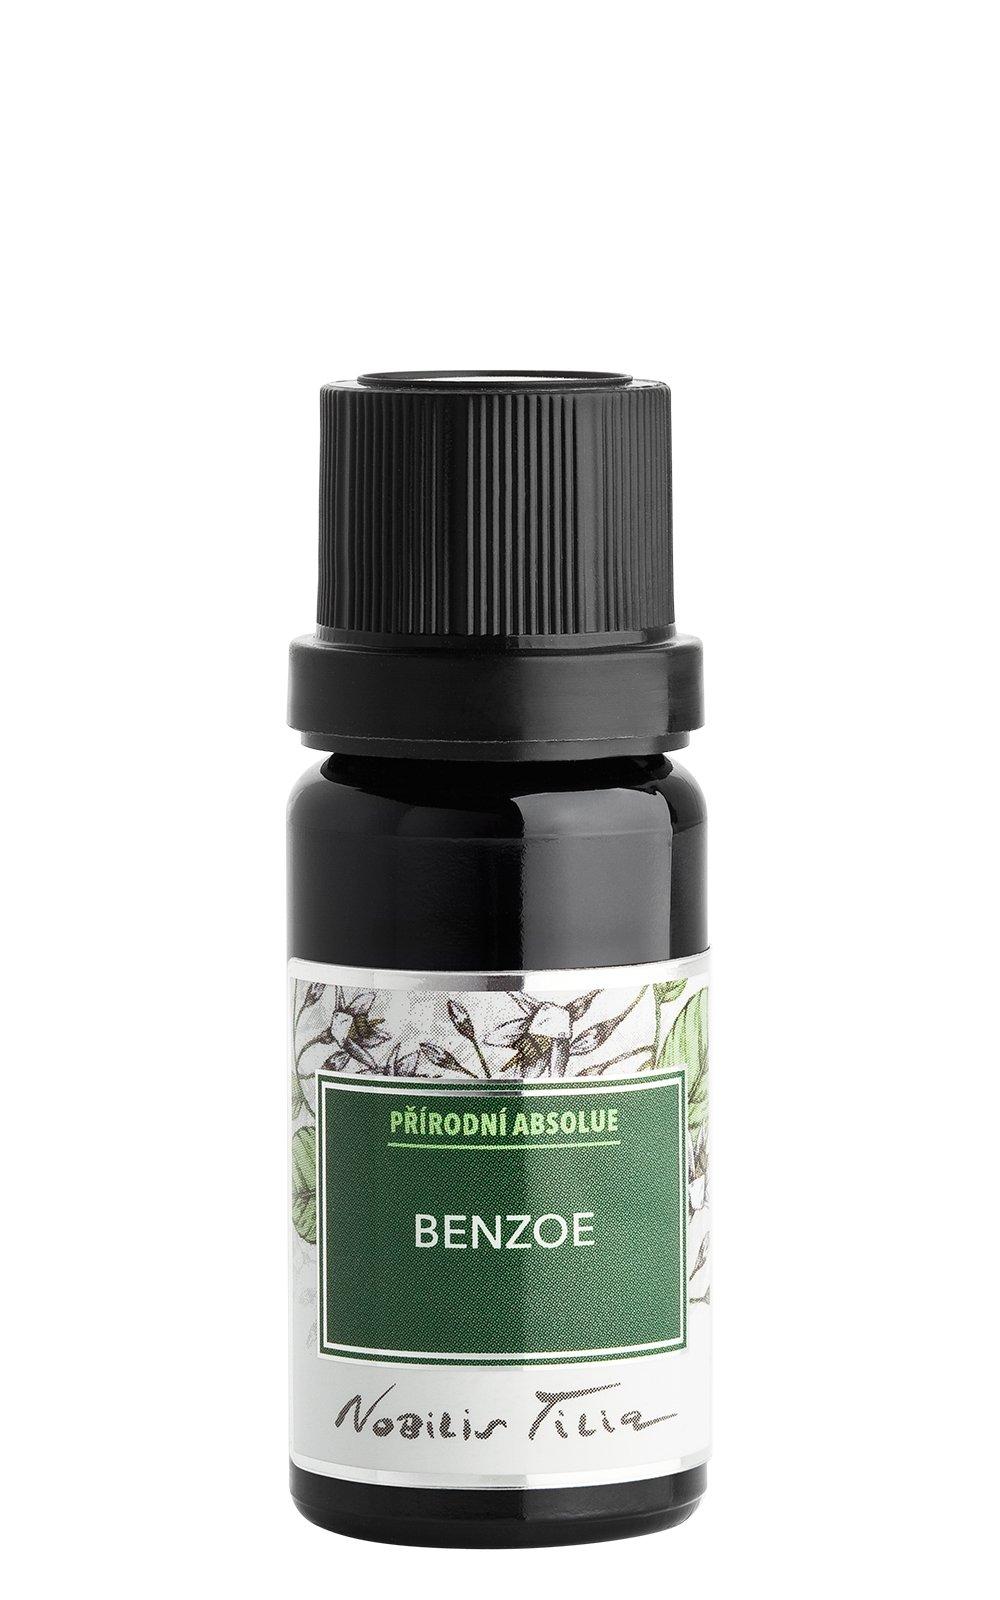 Benzoe absolue 50%: 5 ml